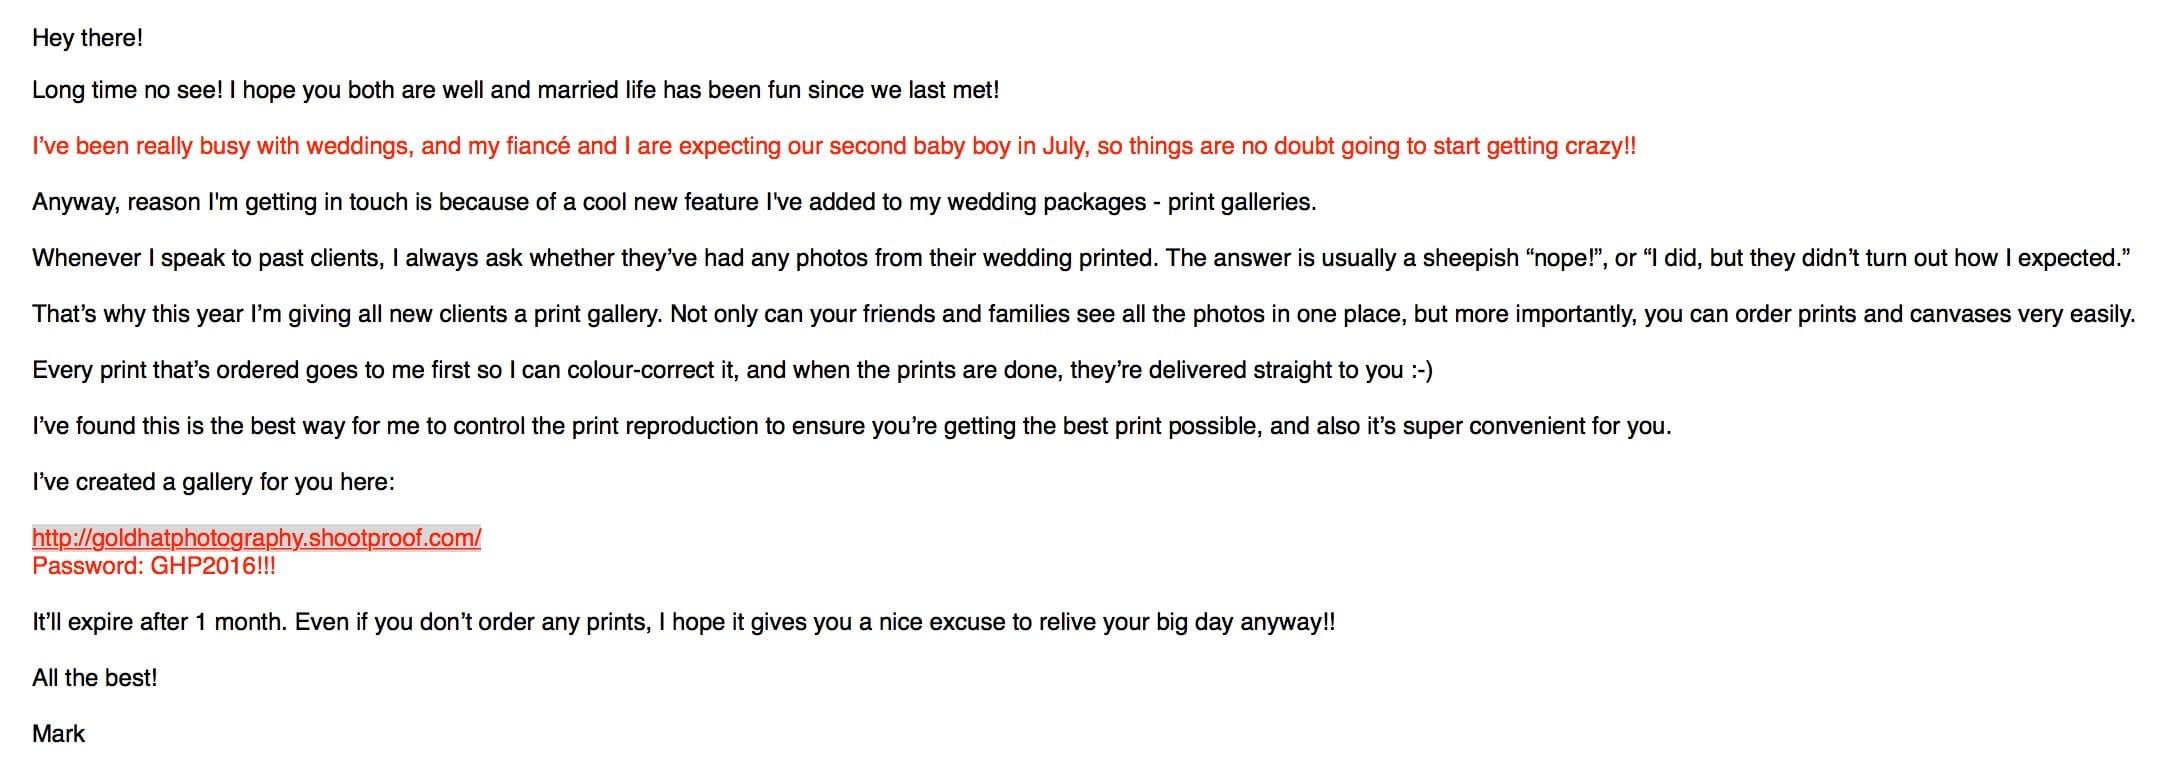 Example Shootproof email